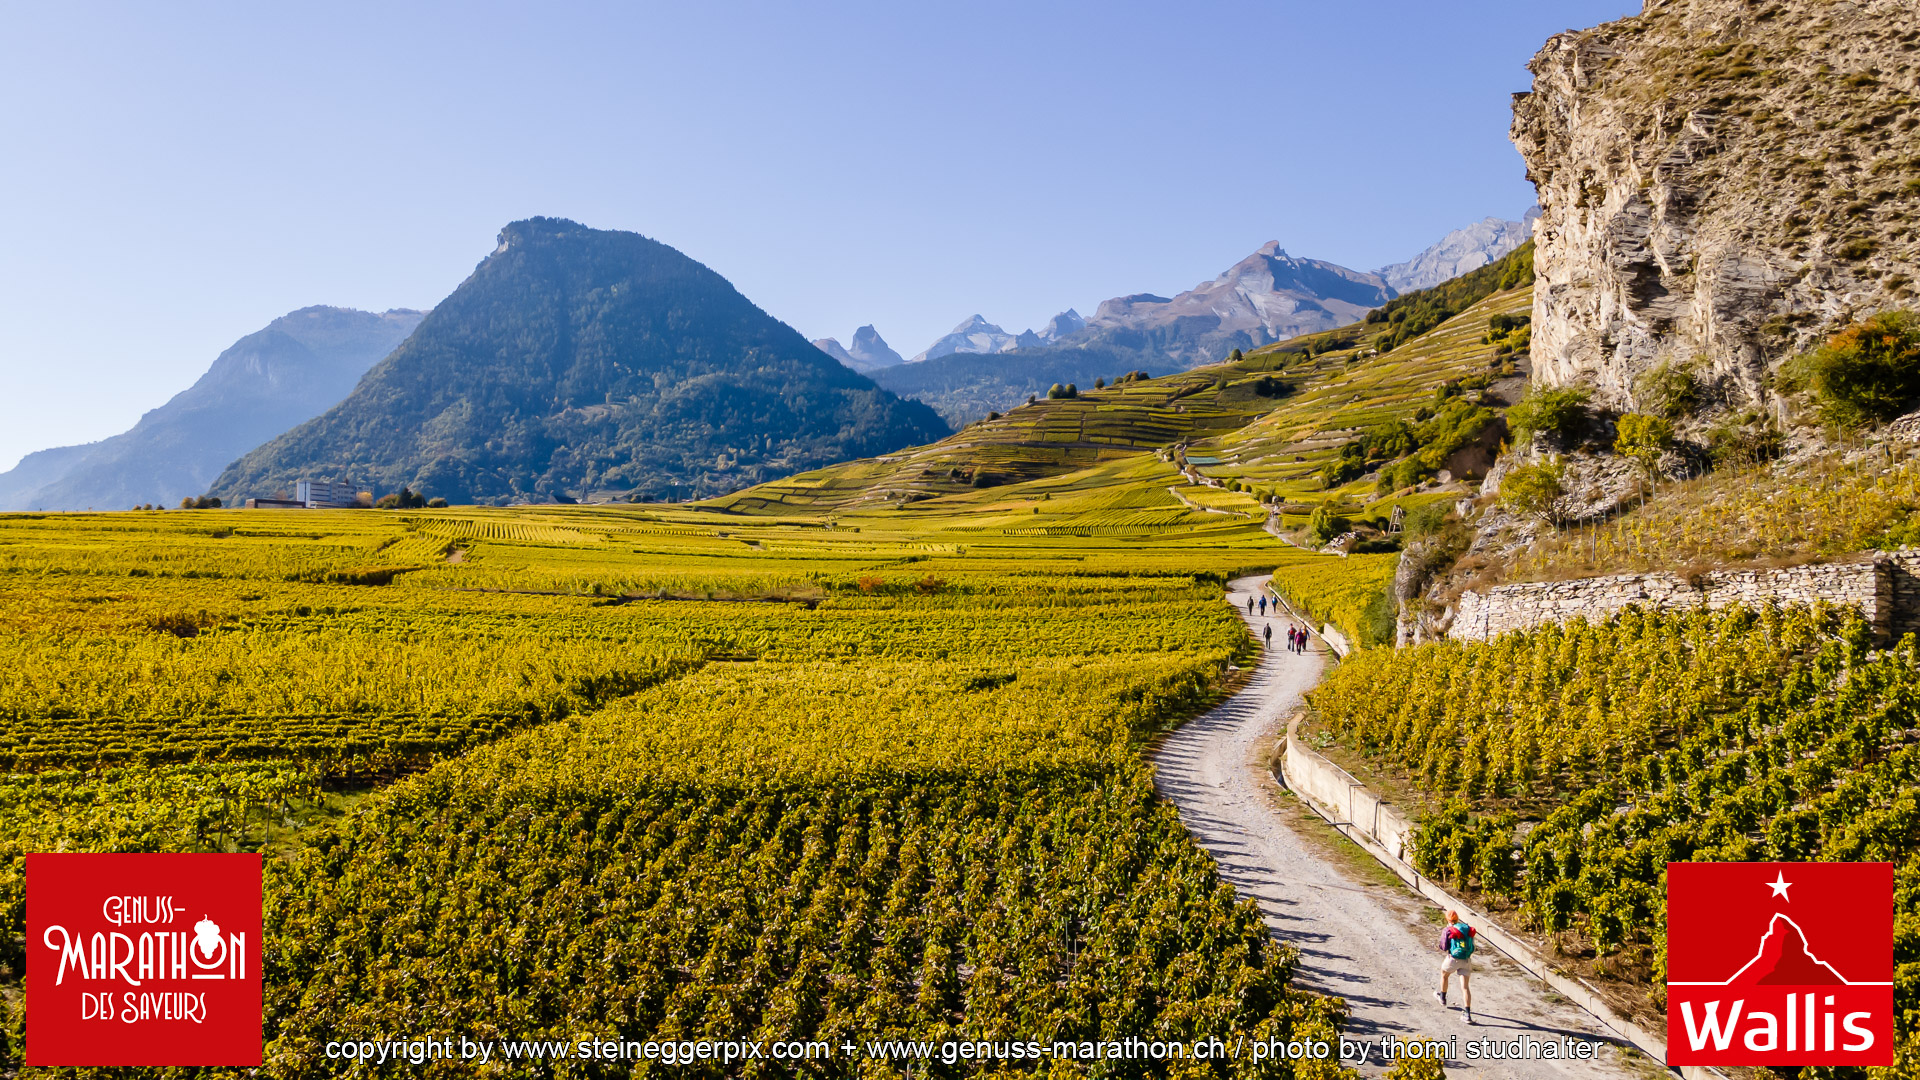 Genuss-Marathon: Wine & Hike